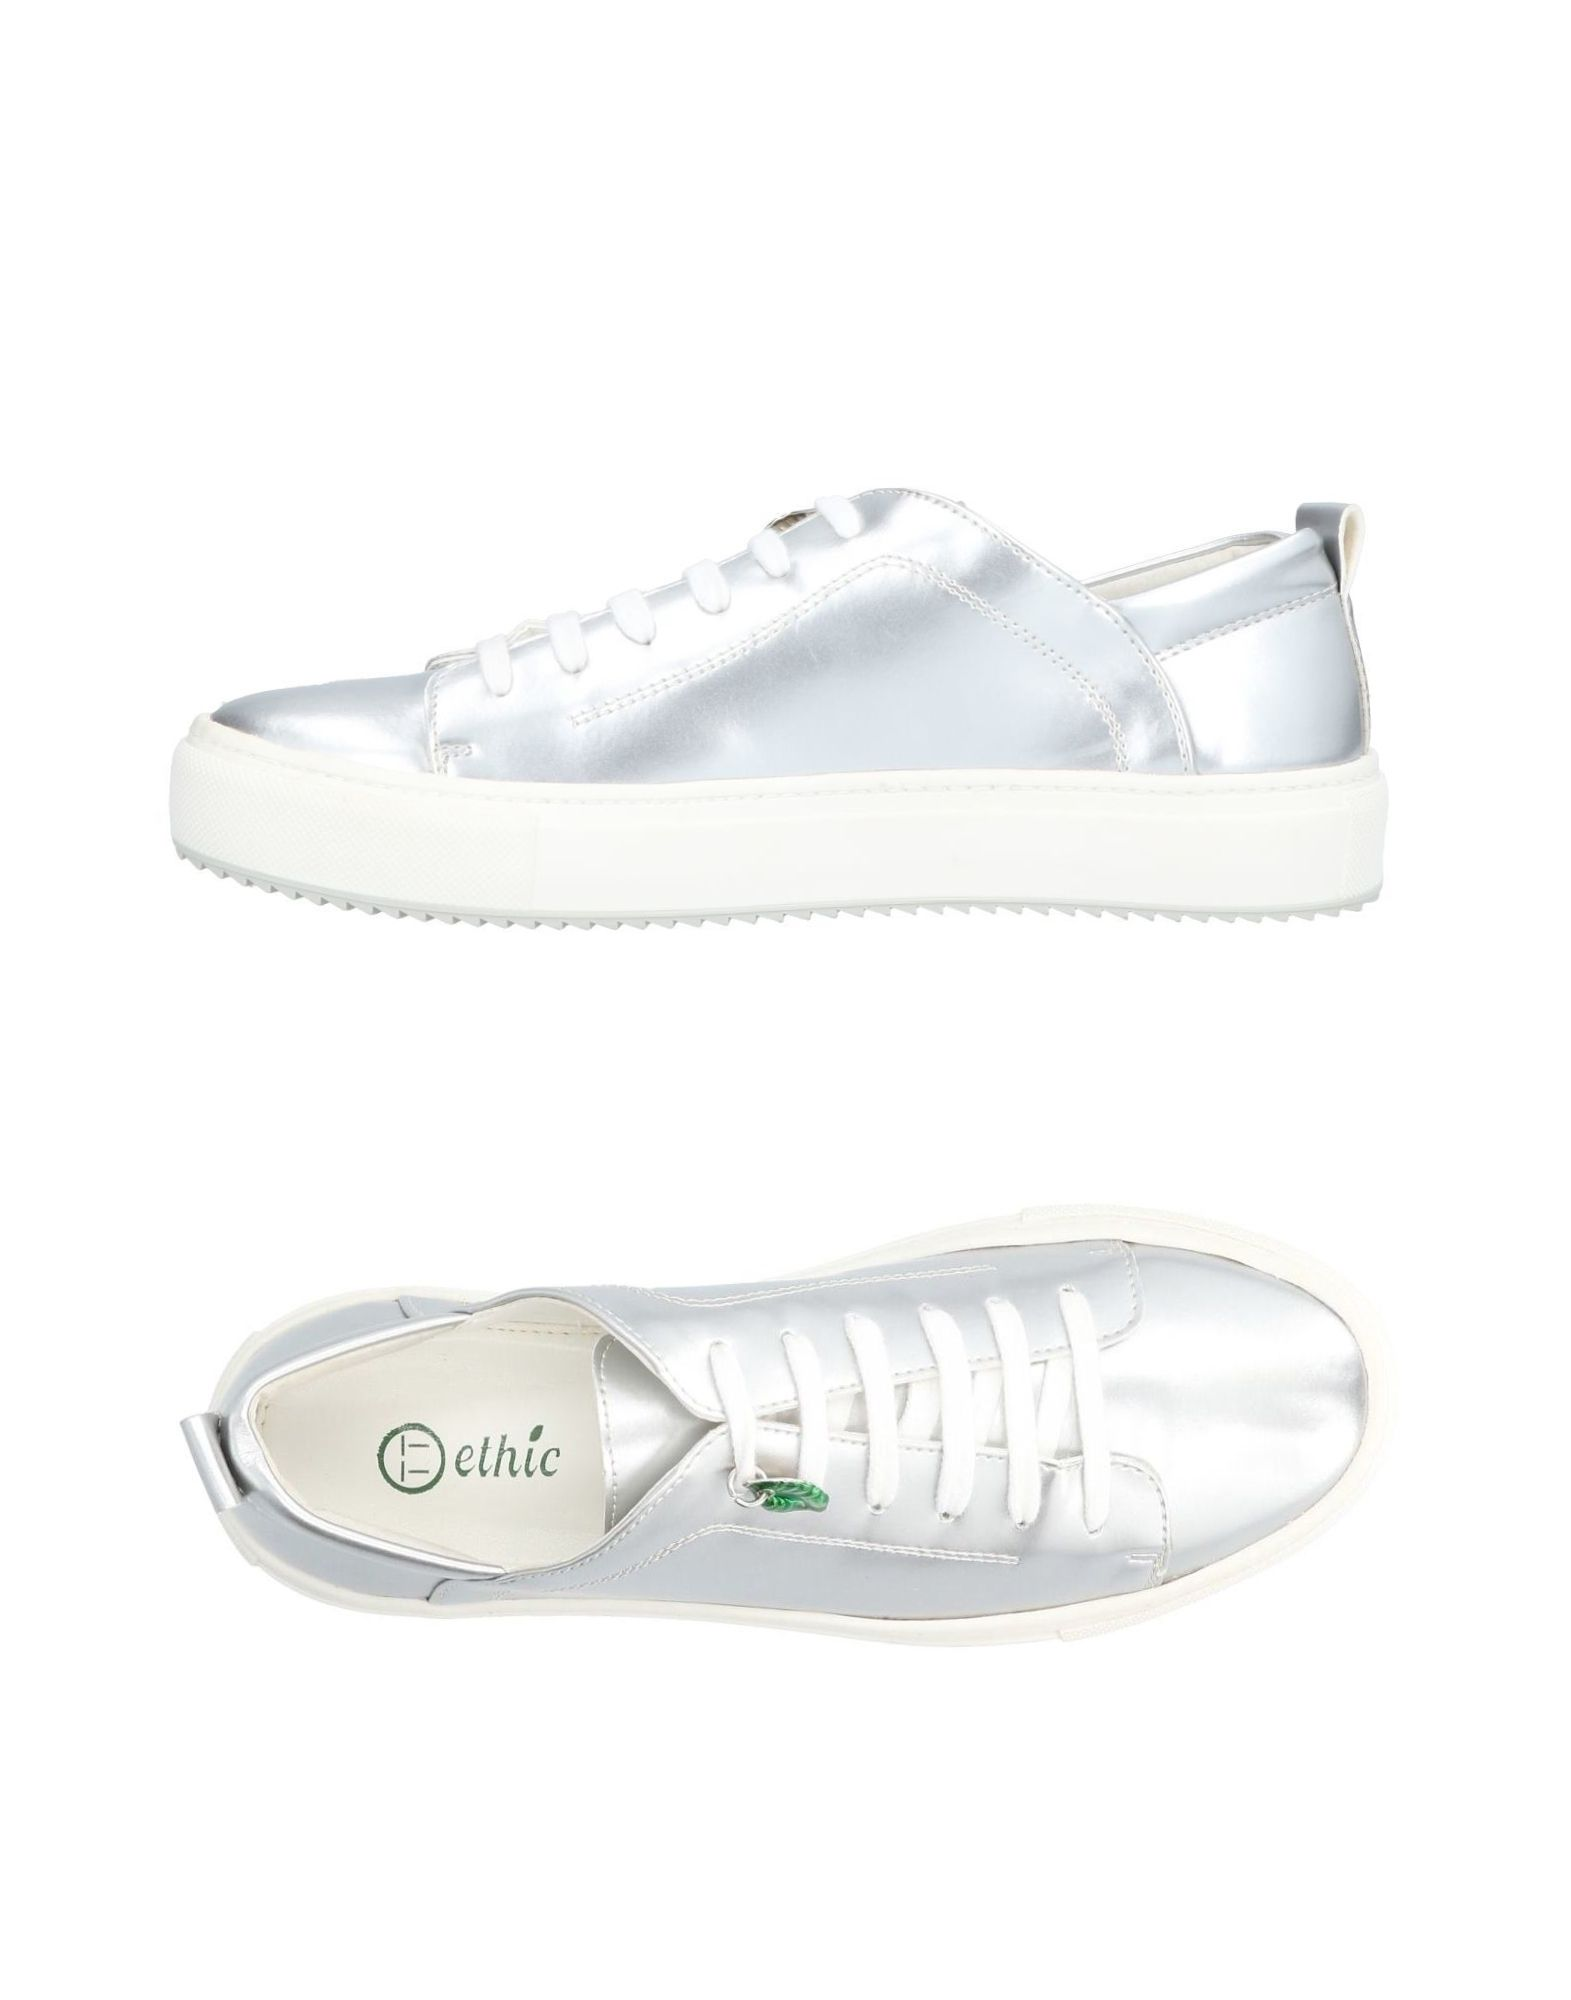 Moda Sneakers Bagatt Donna Donna Bagatt - 11412929WS 9966b9